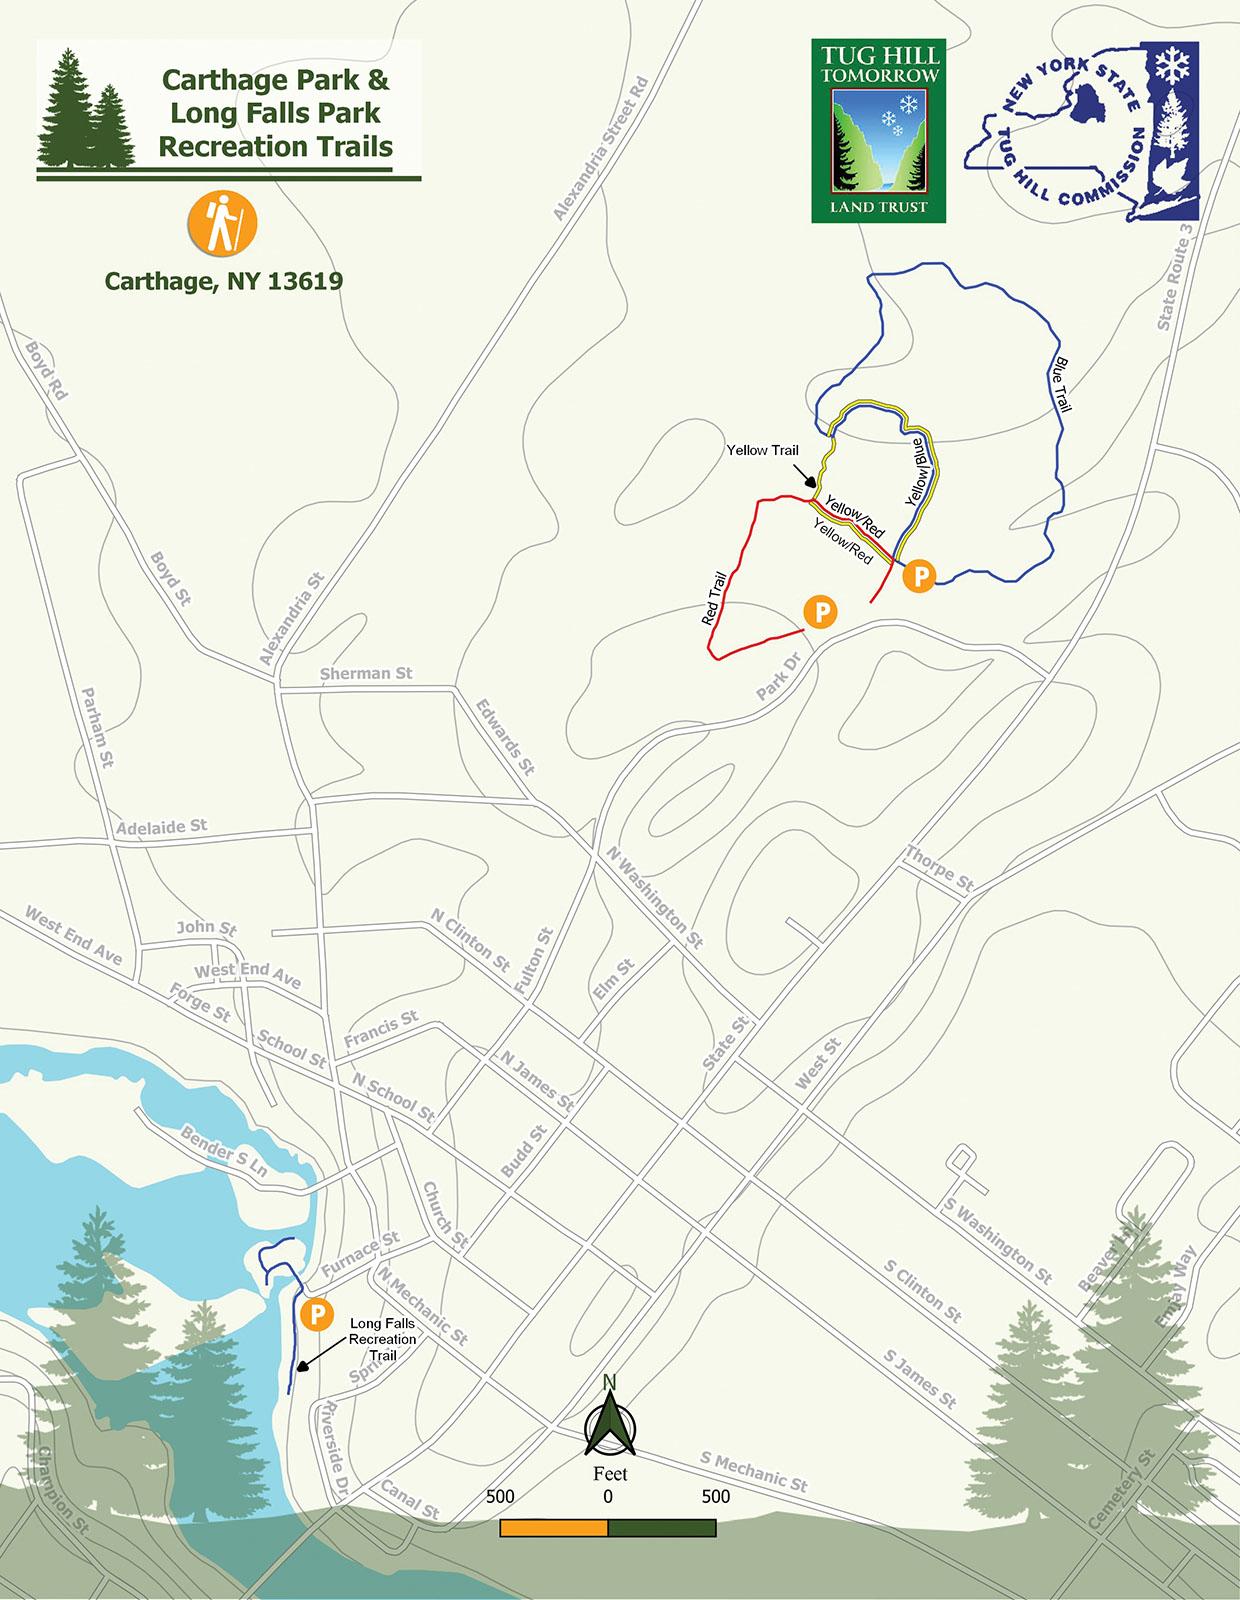 Carthage Trail & Long Falls Park Trails Map